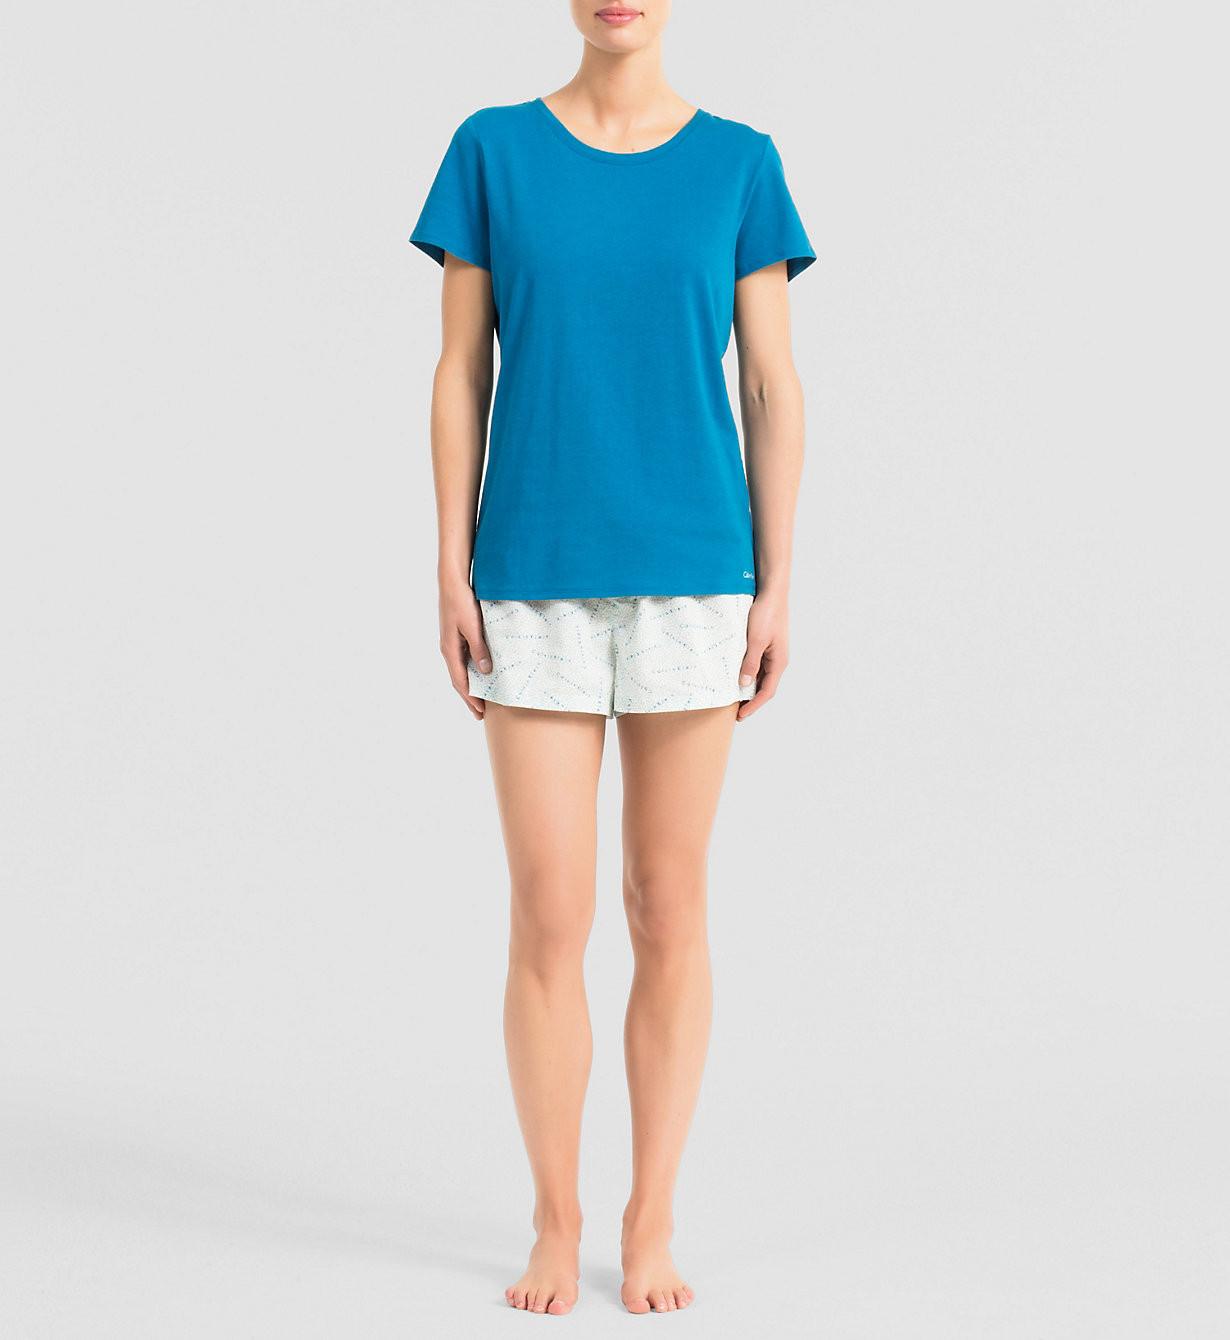 Dámské pyžamo QS5470E - Calvin Klein Barva: bílá-potisk, Velikost: M